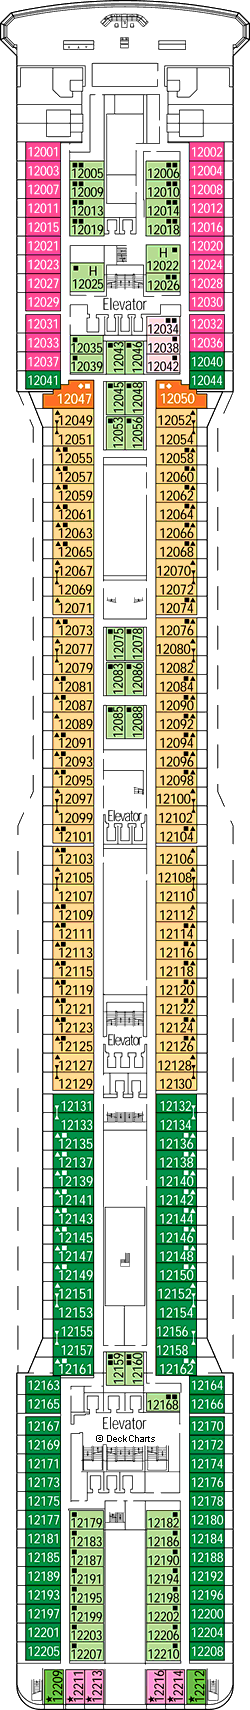 MSC Magnifica: Portovenere Deck